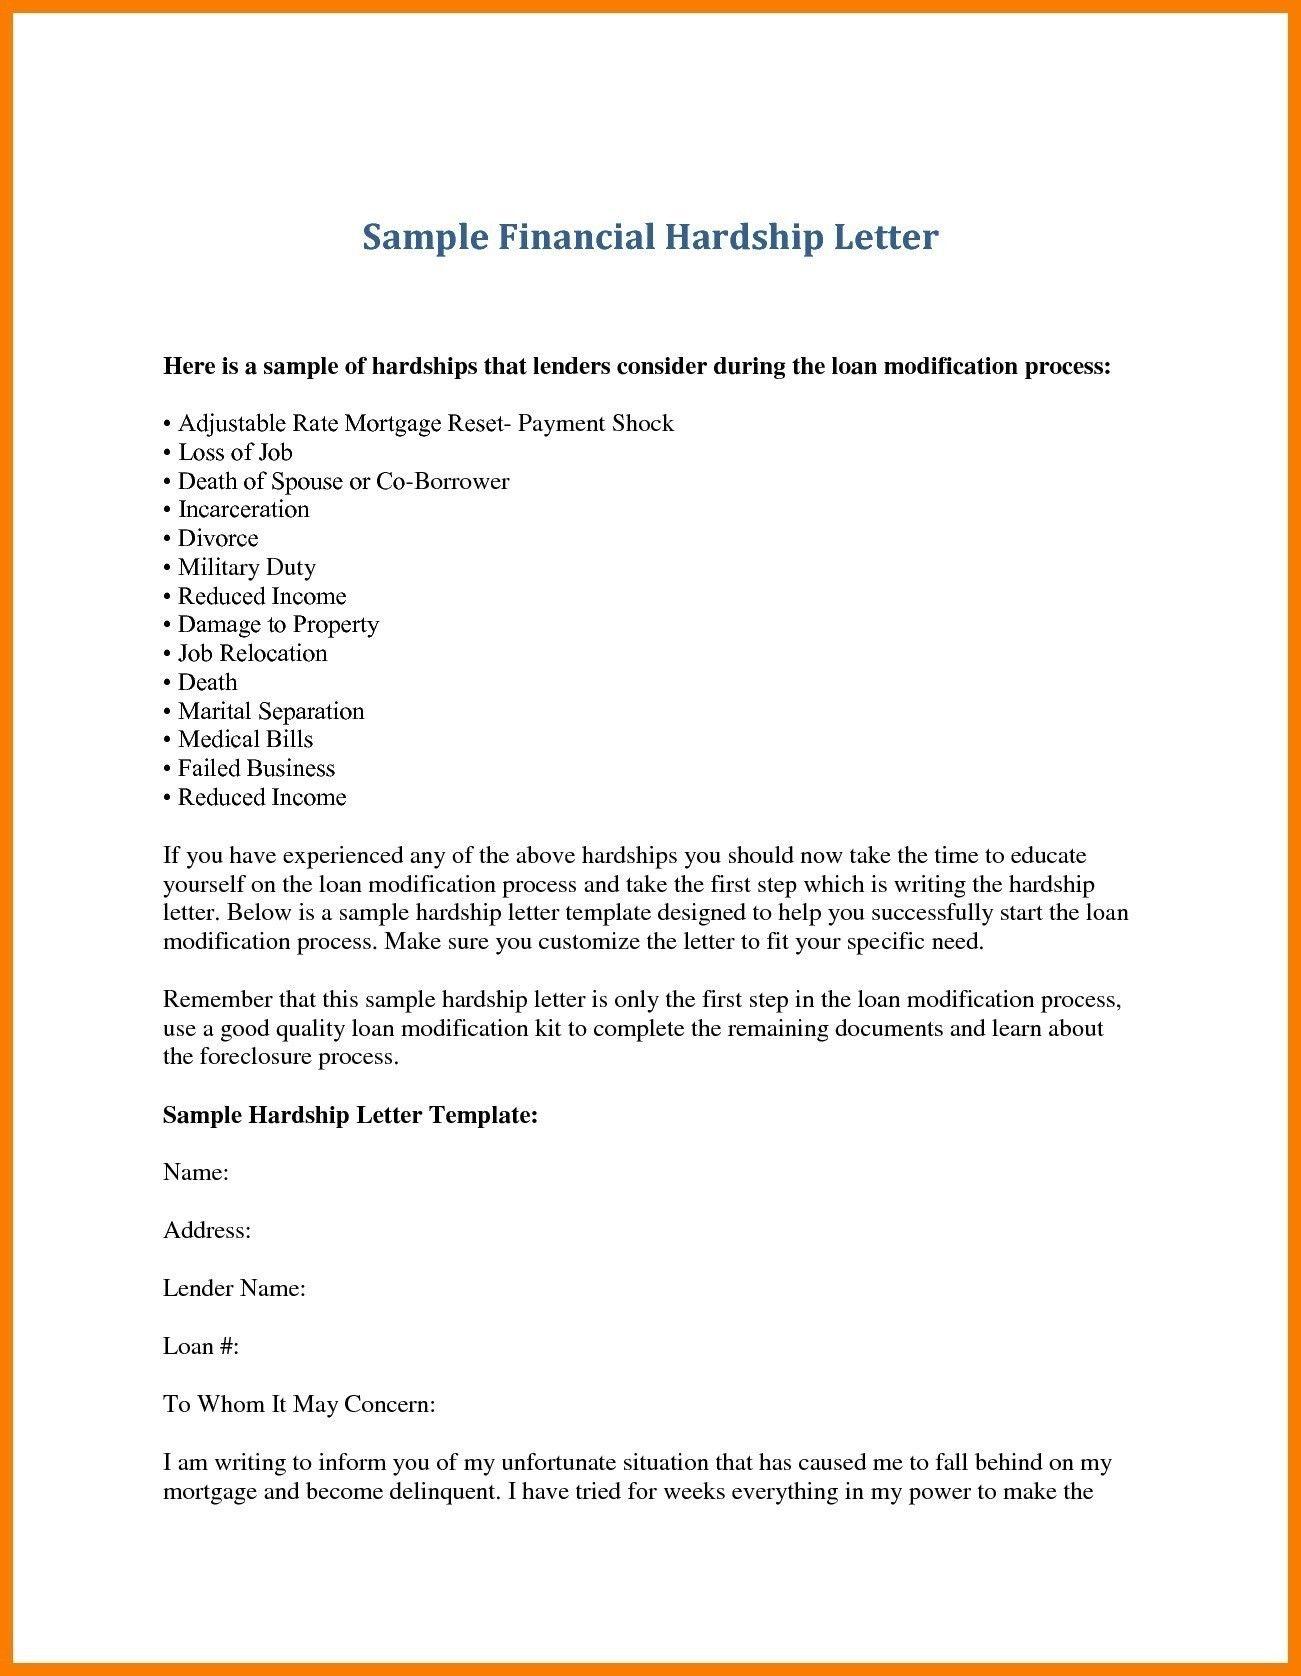 Best Refrence New Hardship Letter For Financial Assistance By Httpwaldwert Visit Details Https Httpwaldwer Loan Modification Lettering Financial Assistance